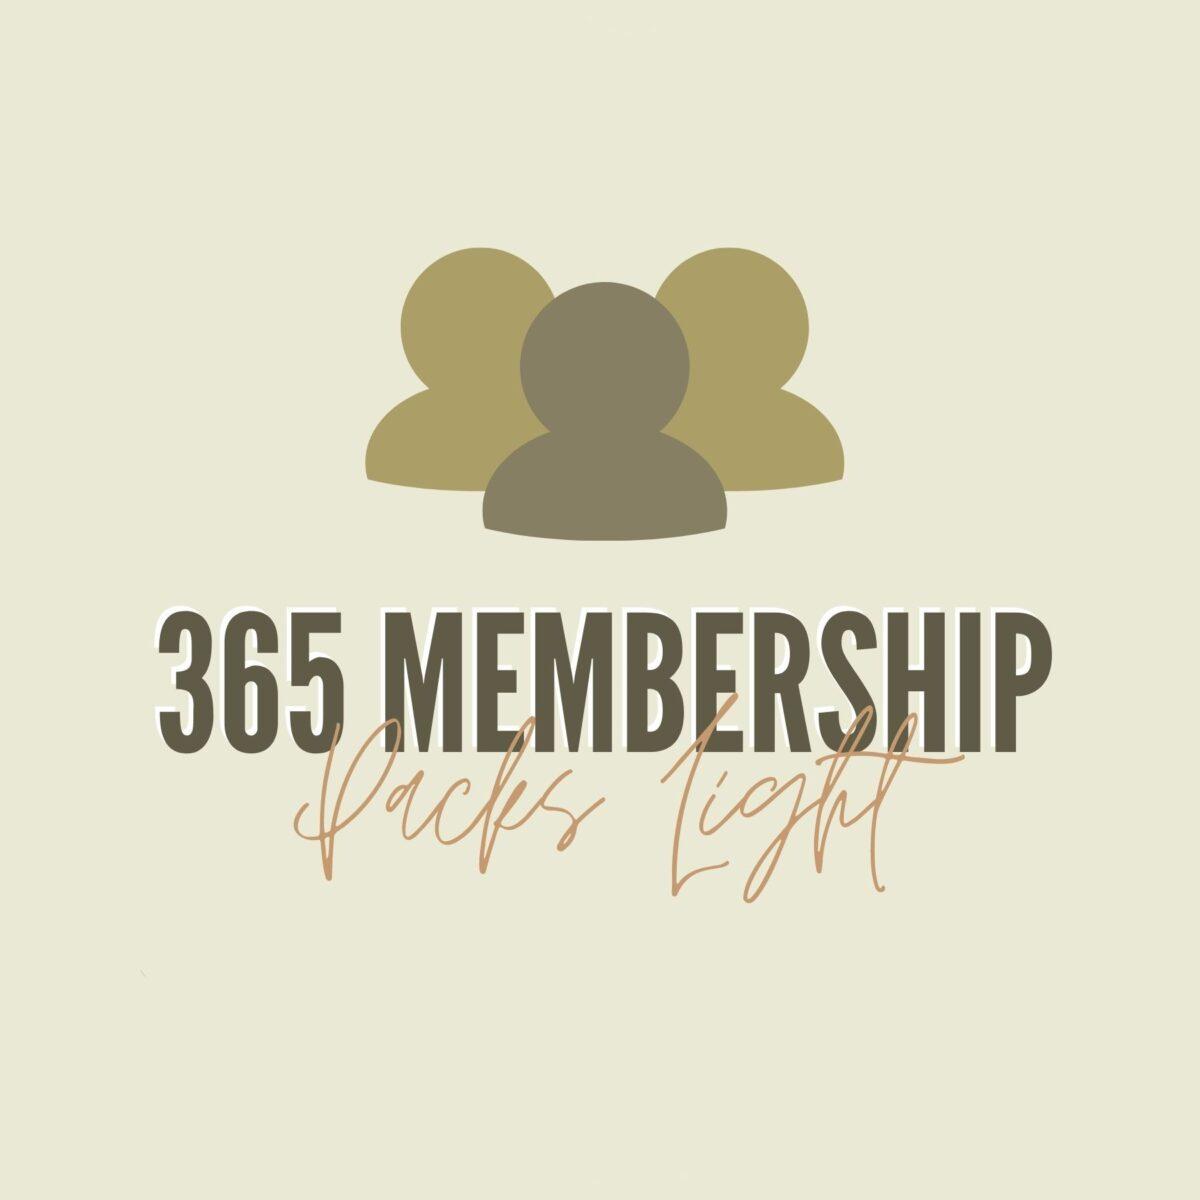 Join the 365Membership